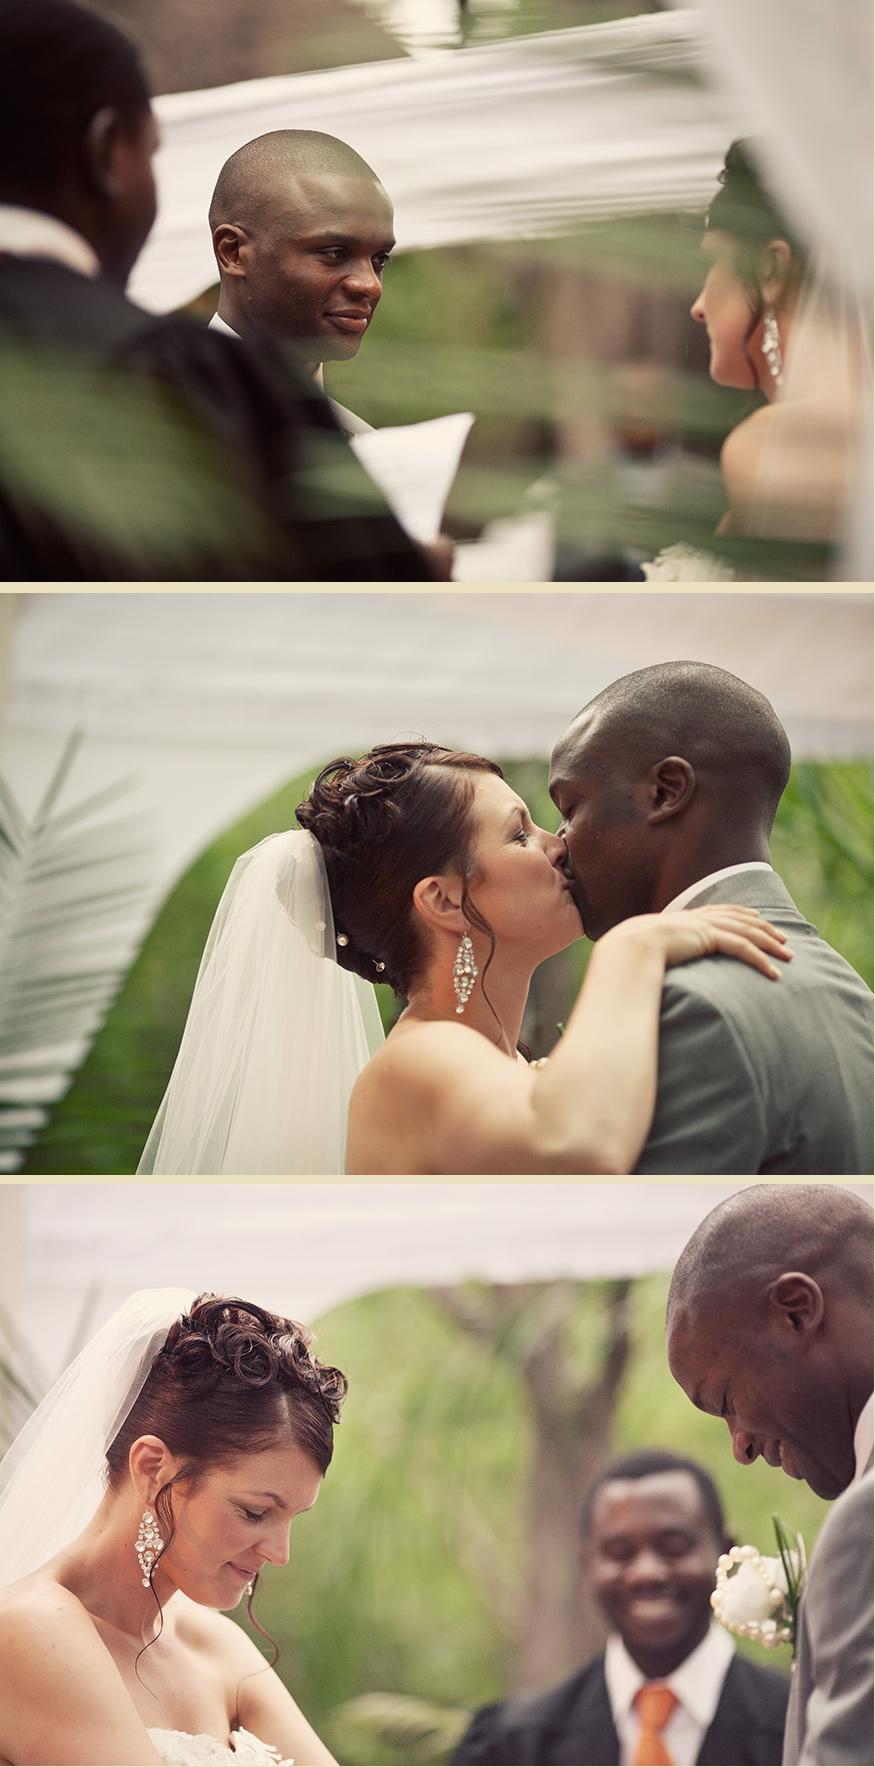 Brisbane Wedding Phoographer Blog-collage-1329183077168